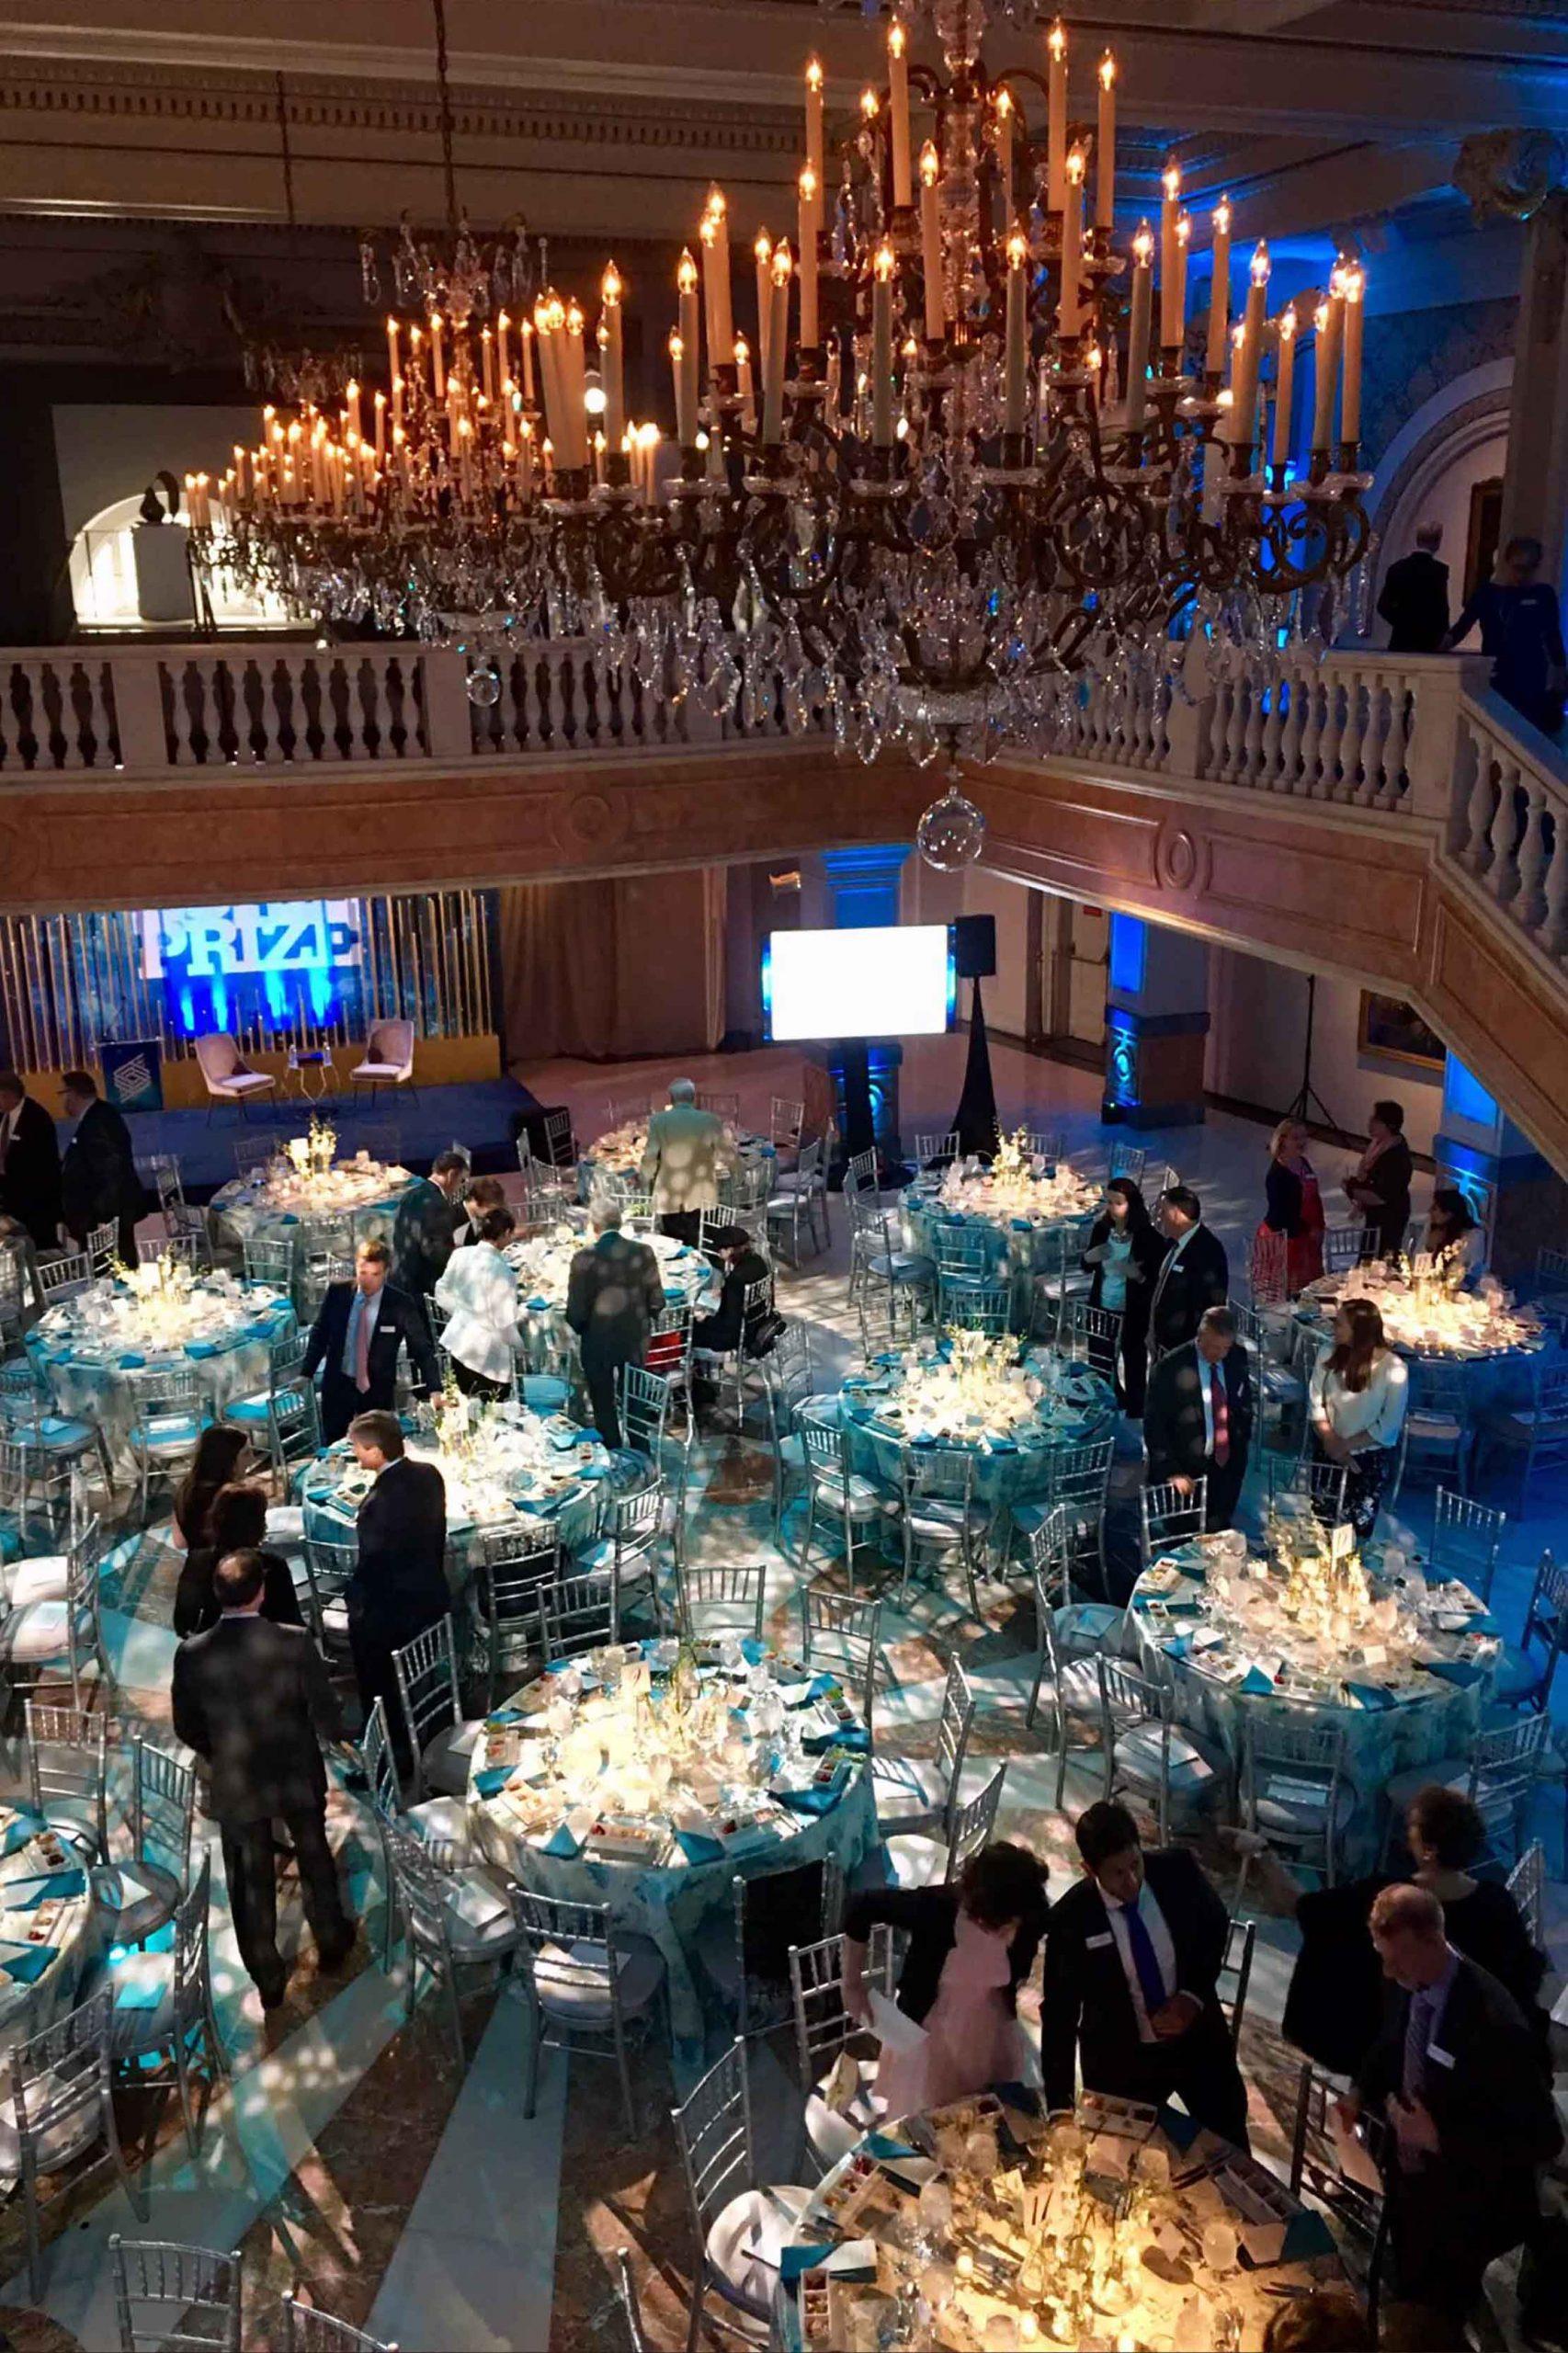 Dr. Fauci; award ceremony; gala; invitation; luxury invitation; classy; events; event professional; logo; small business; branding; annapolis; graphic design; washington dc